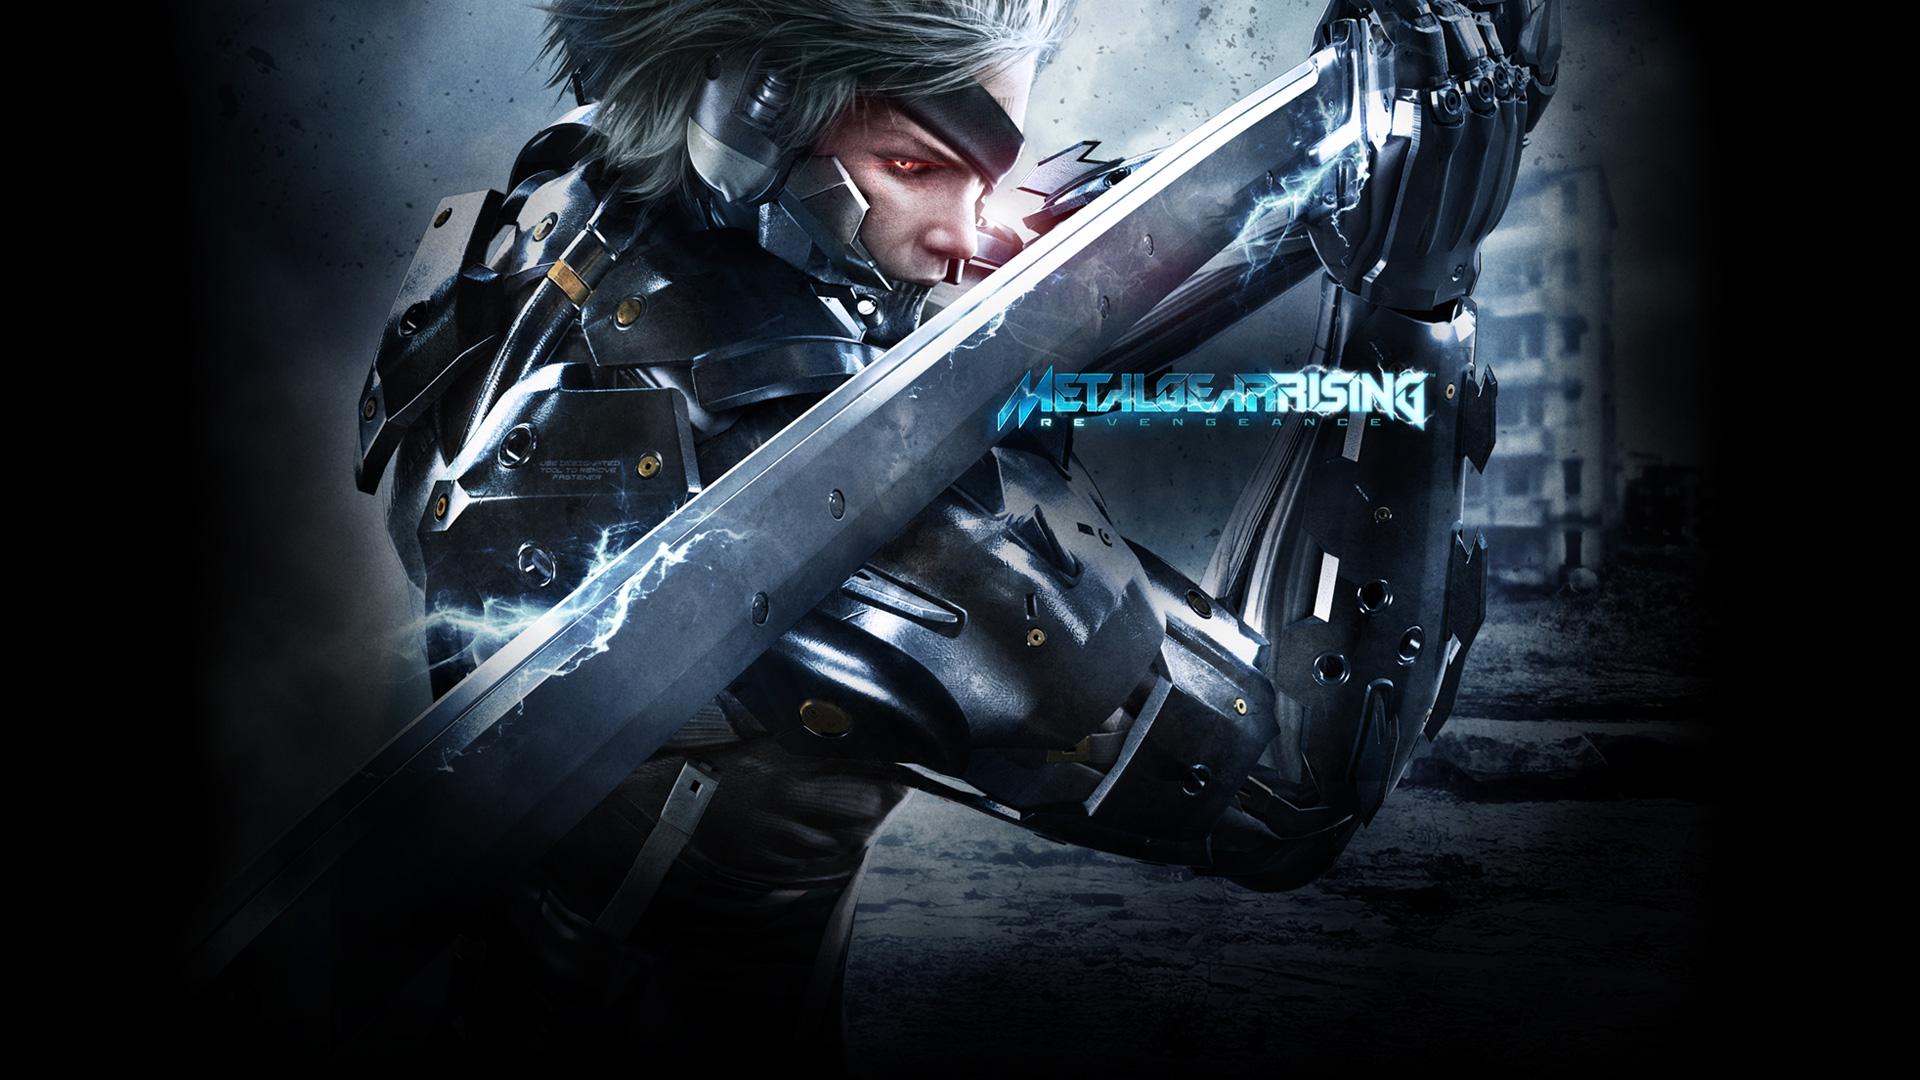 Video Game Metal Gear Rising Revengeance Wallpaper